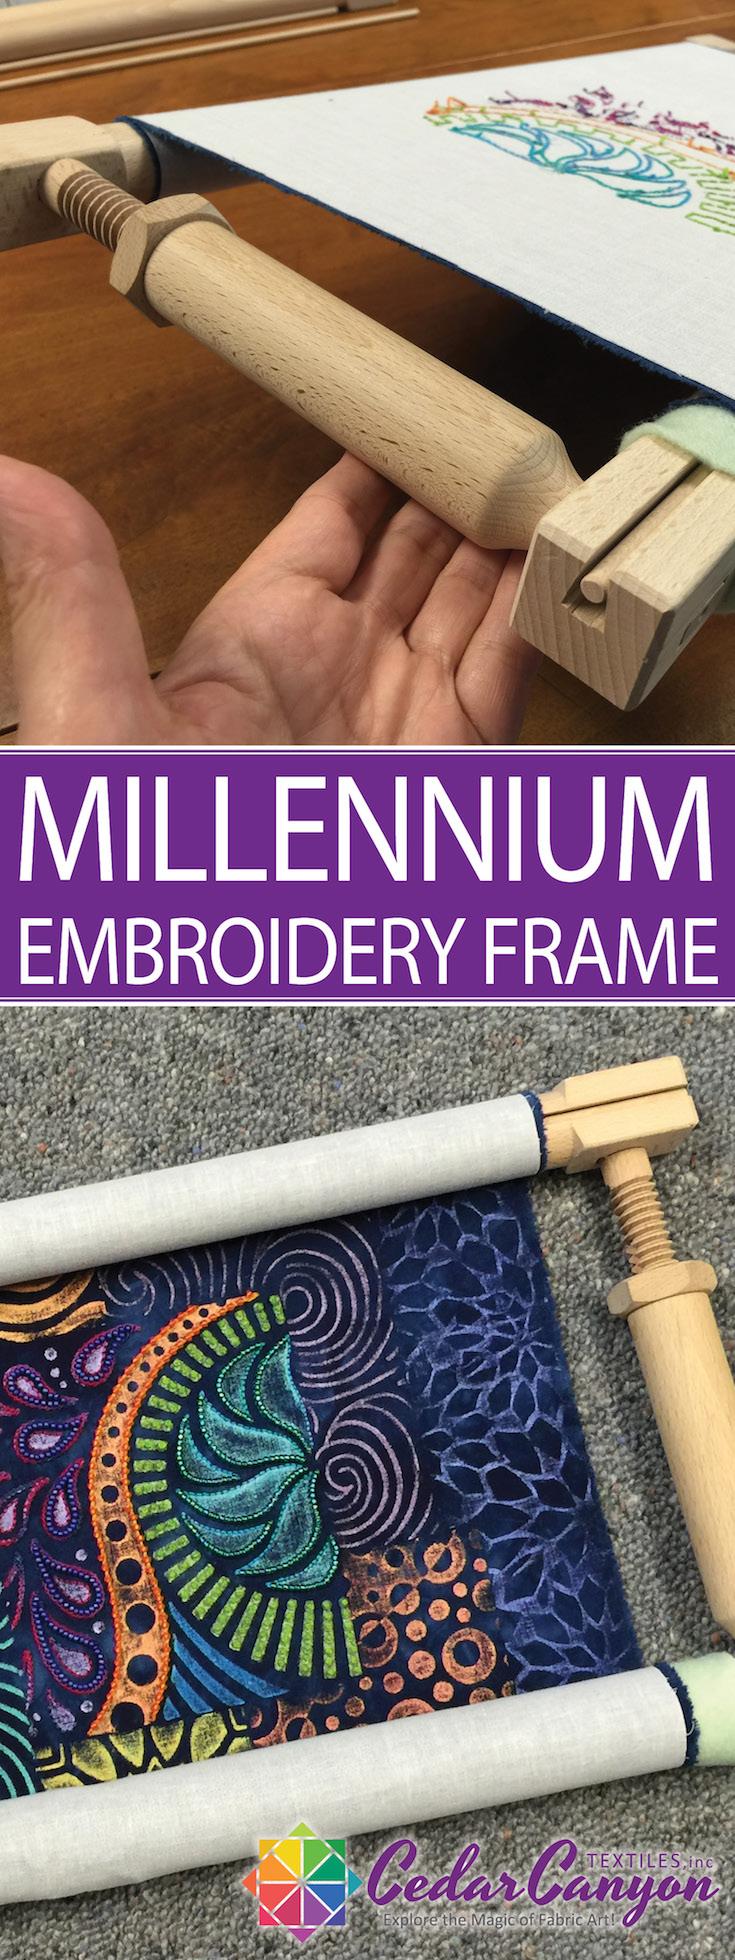 Millennium Embroidery Frame Review - Cedar Canyon Textiles